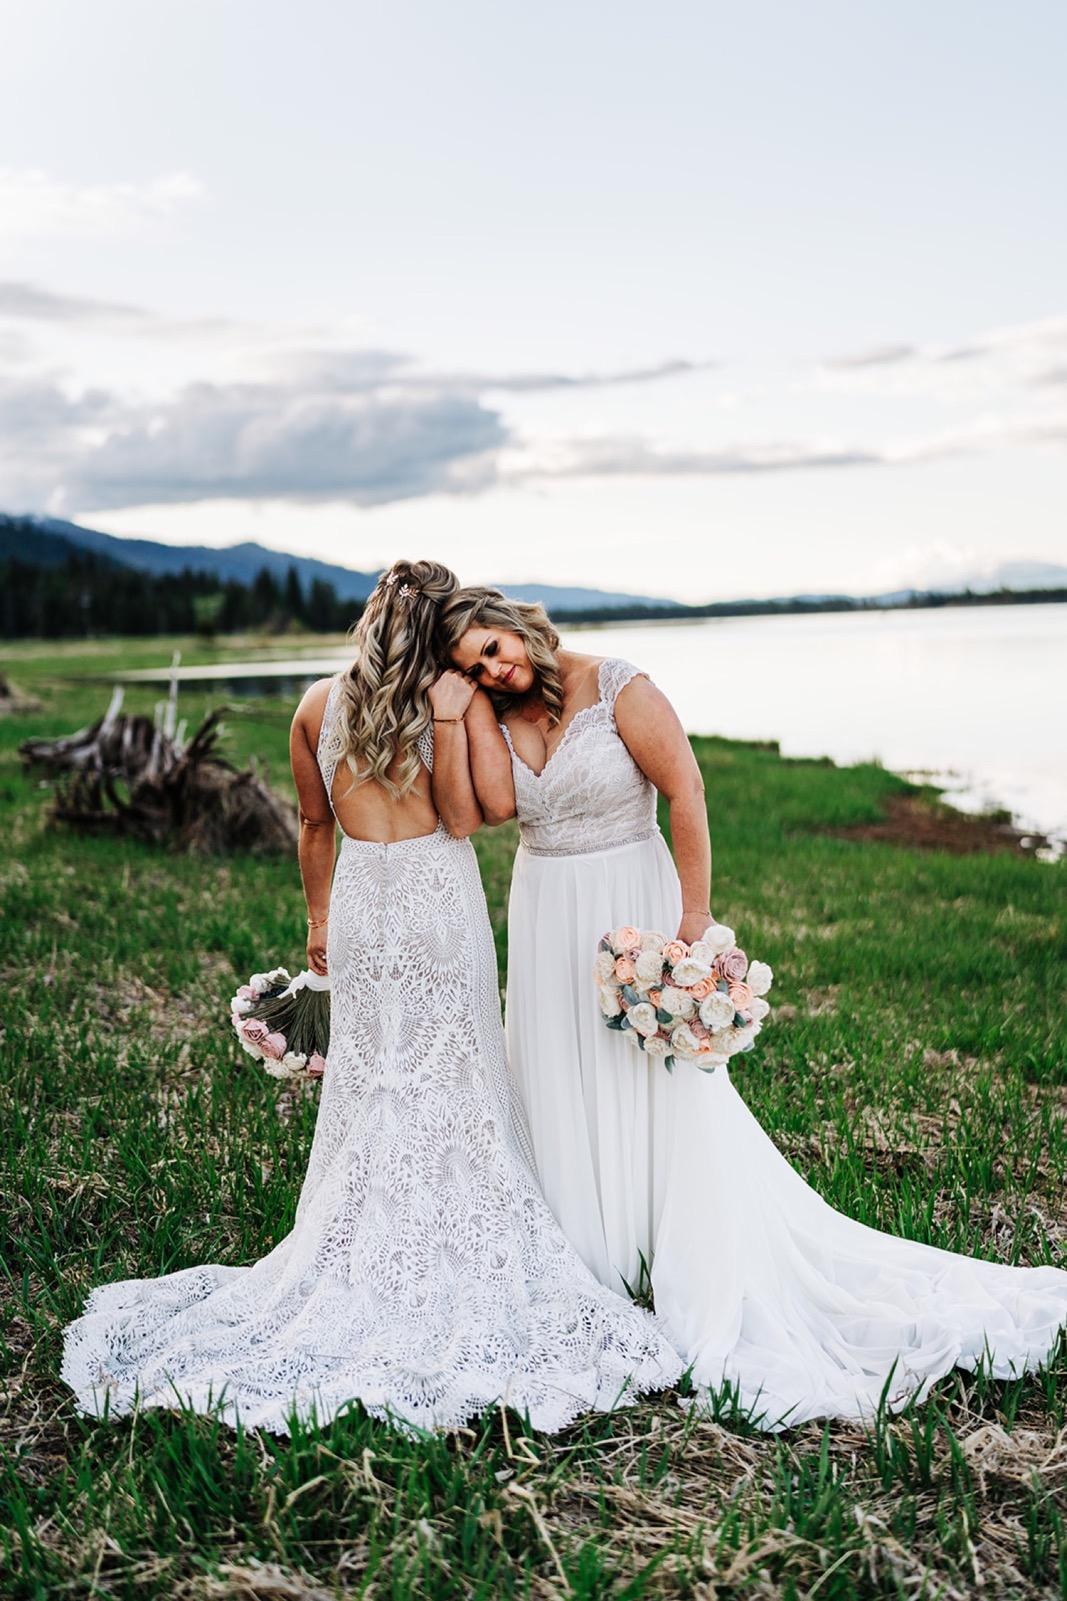 187_falissa_heather_wedding-532.jpg